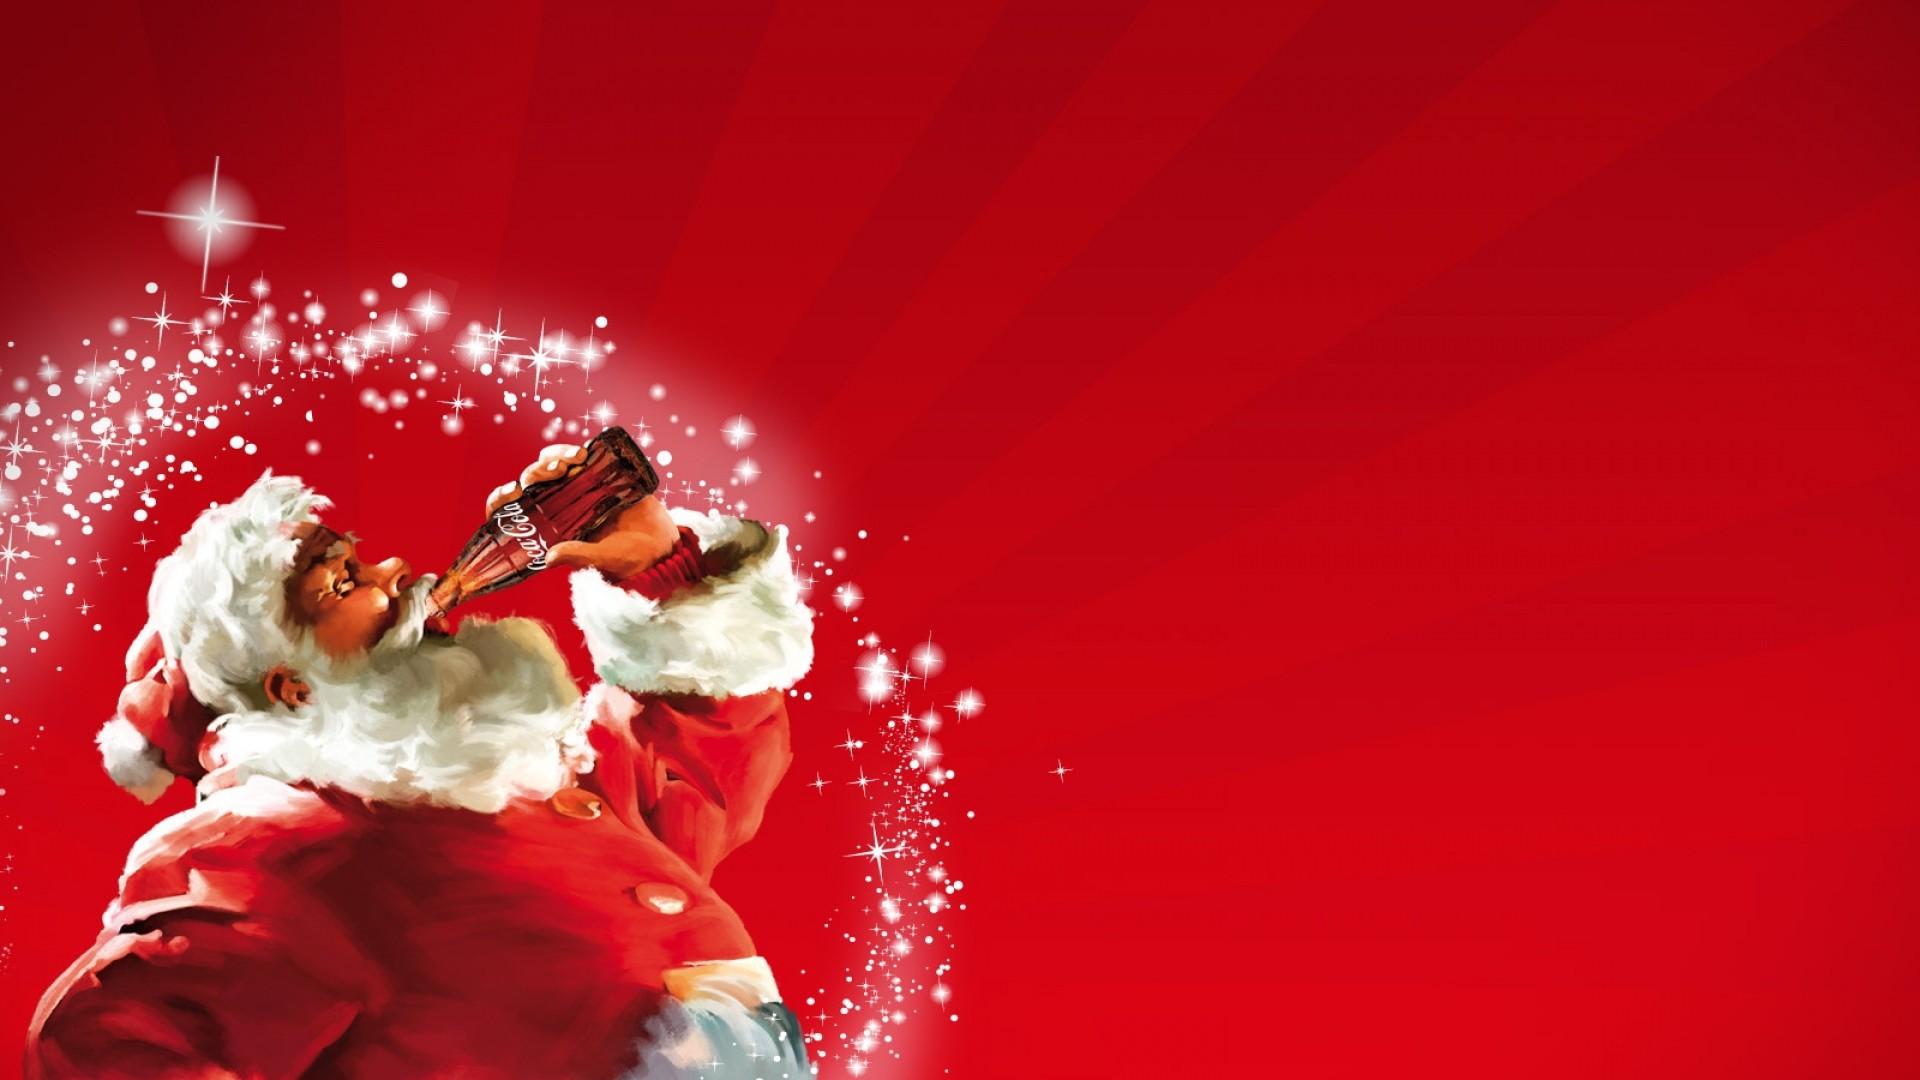 Santa Claus Wallpaper ·① WallpaperTag